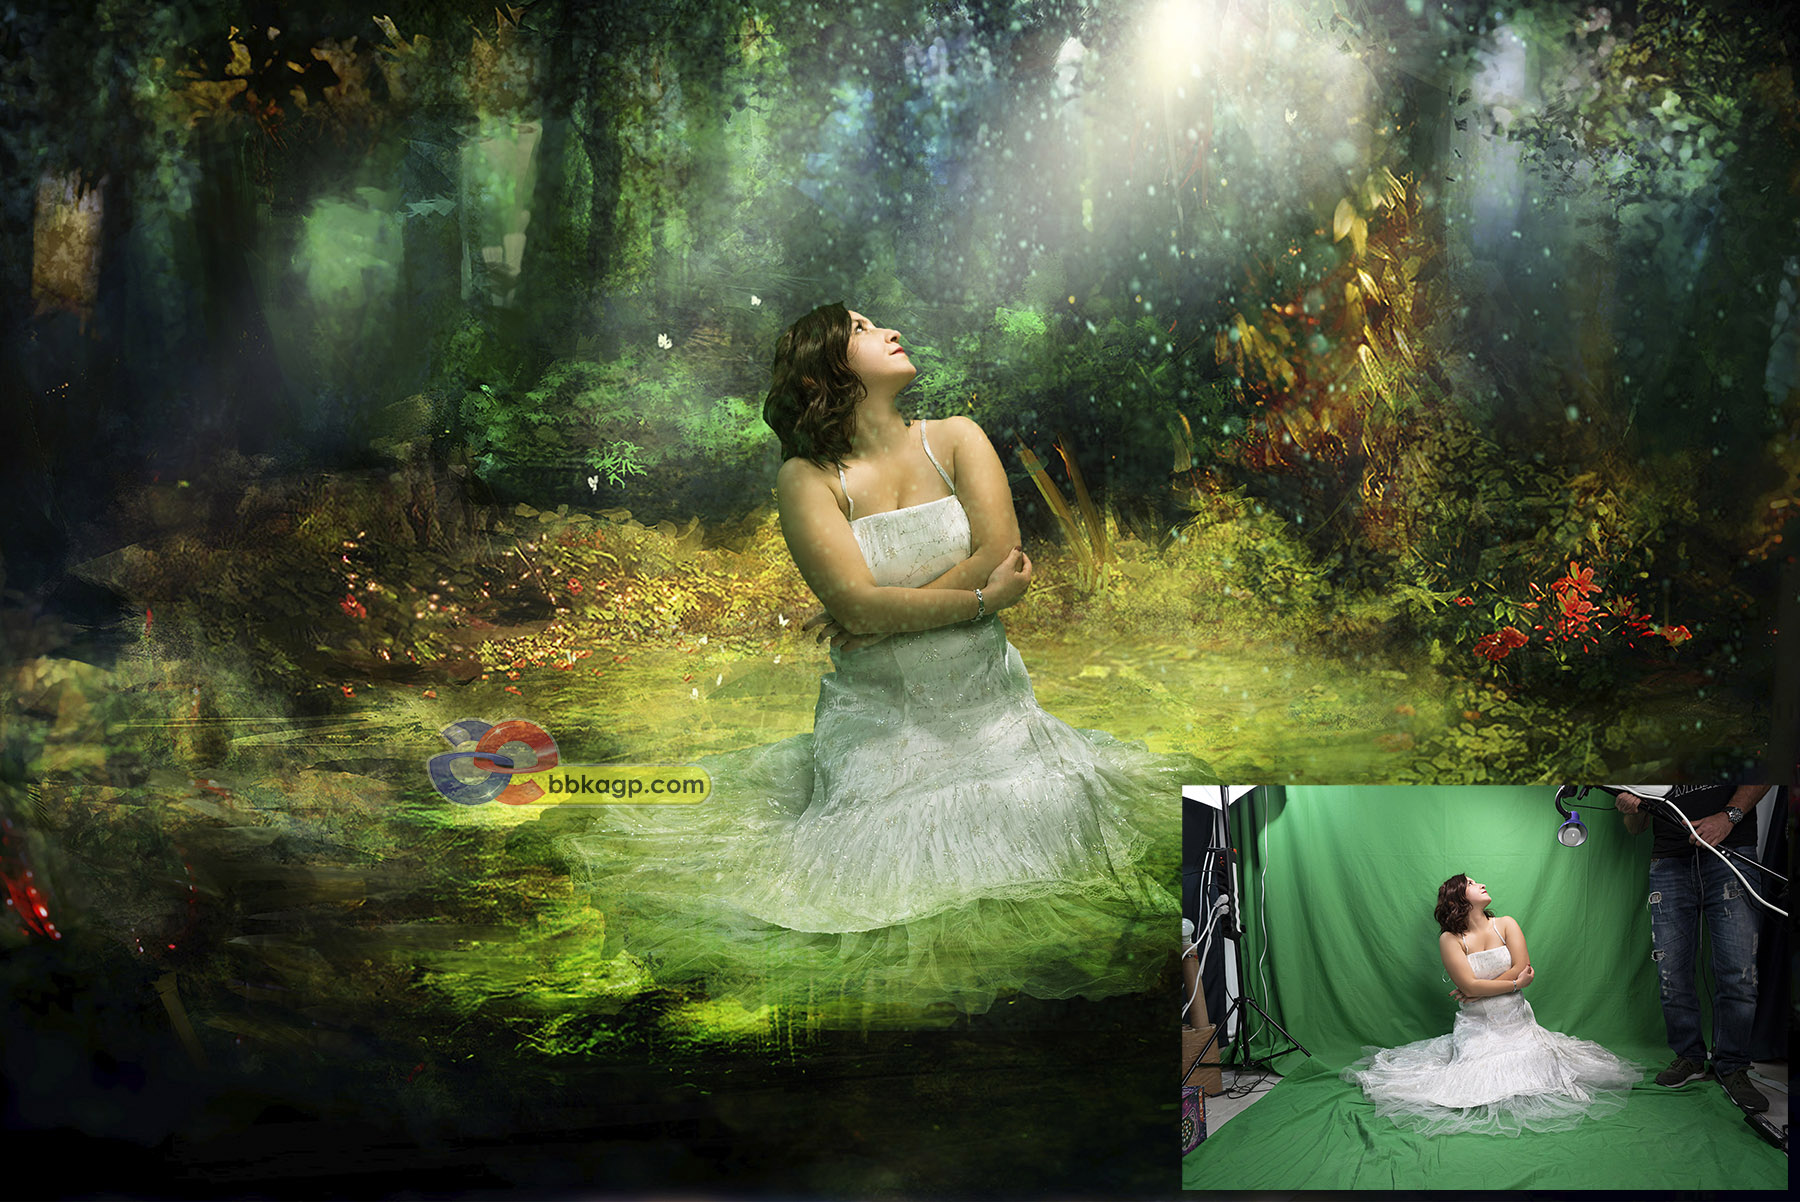 Fantastic Fotograf Cekimi ve ileri photoshop Kursu